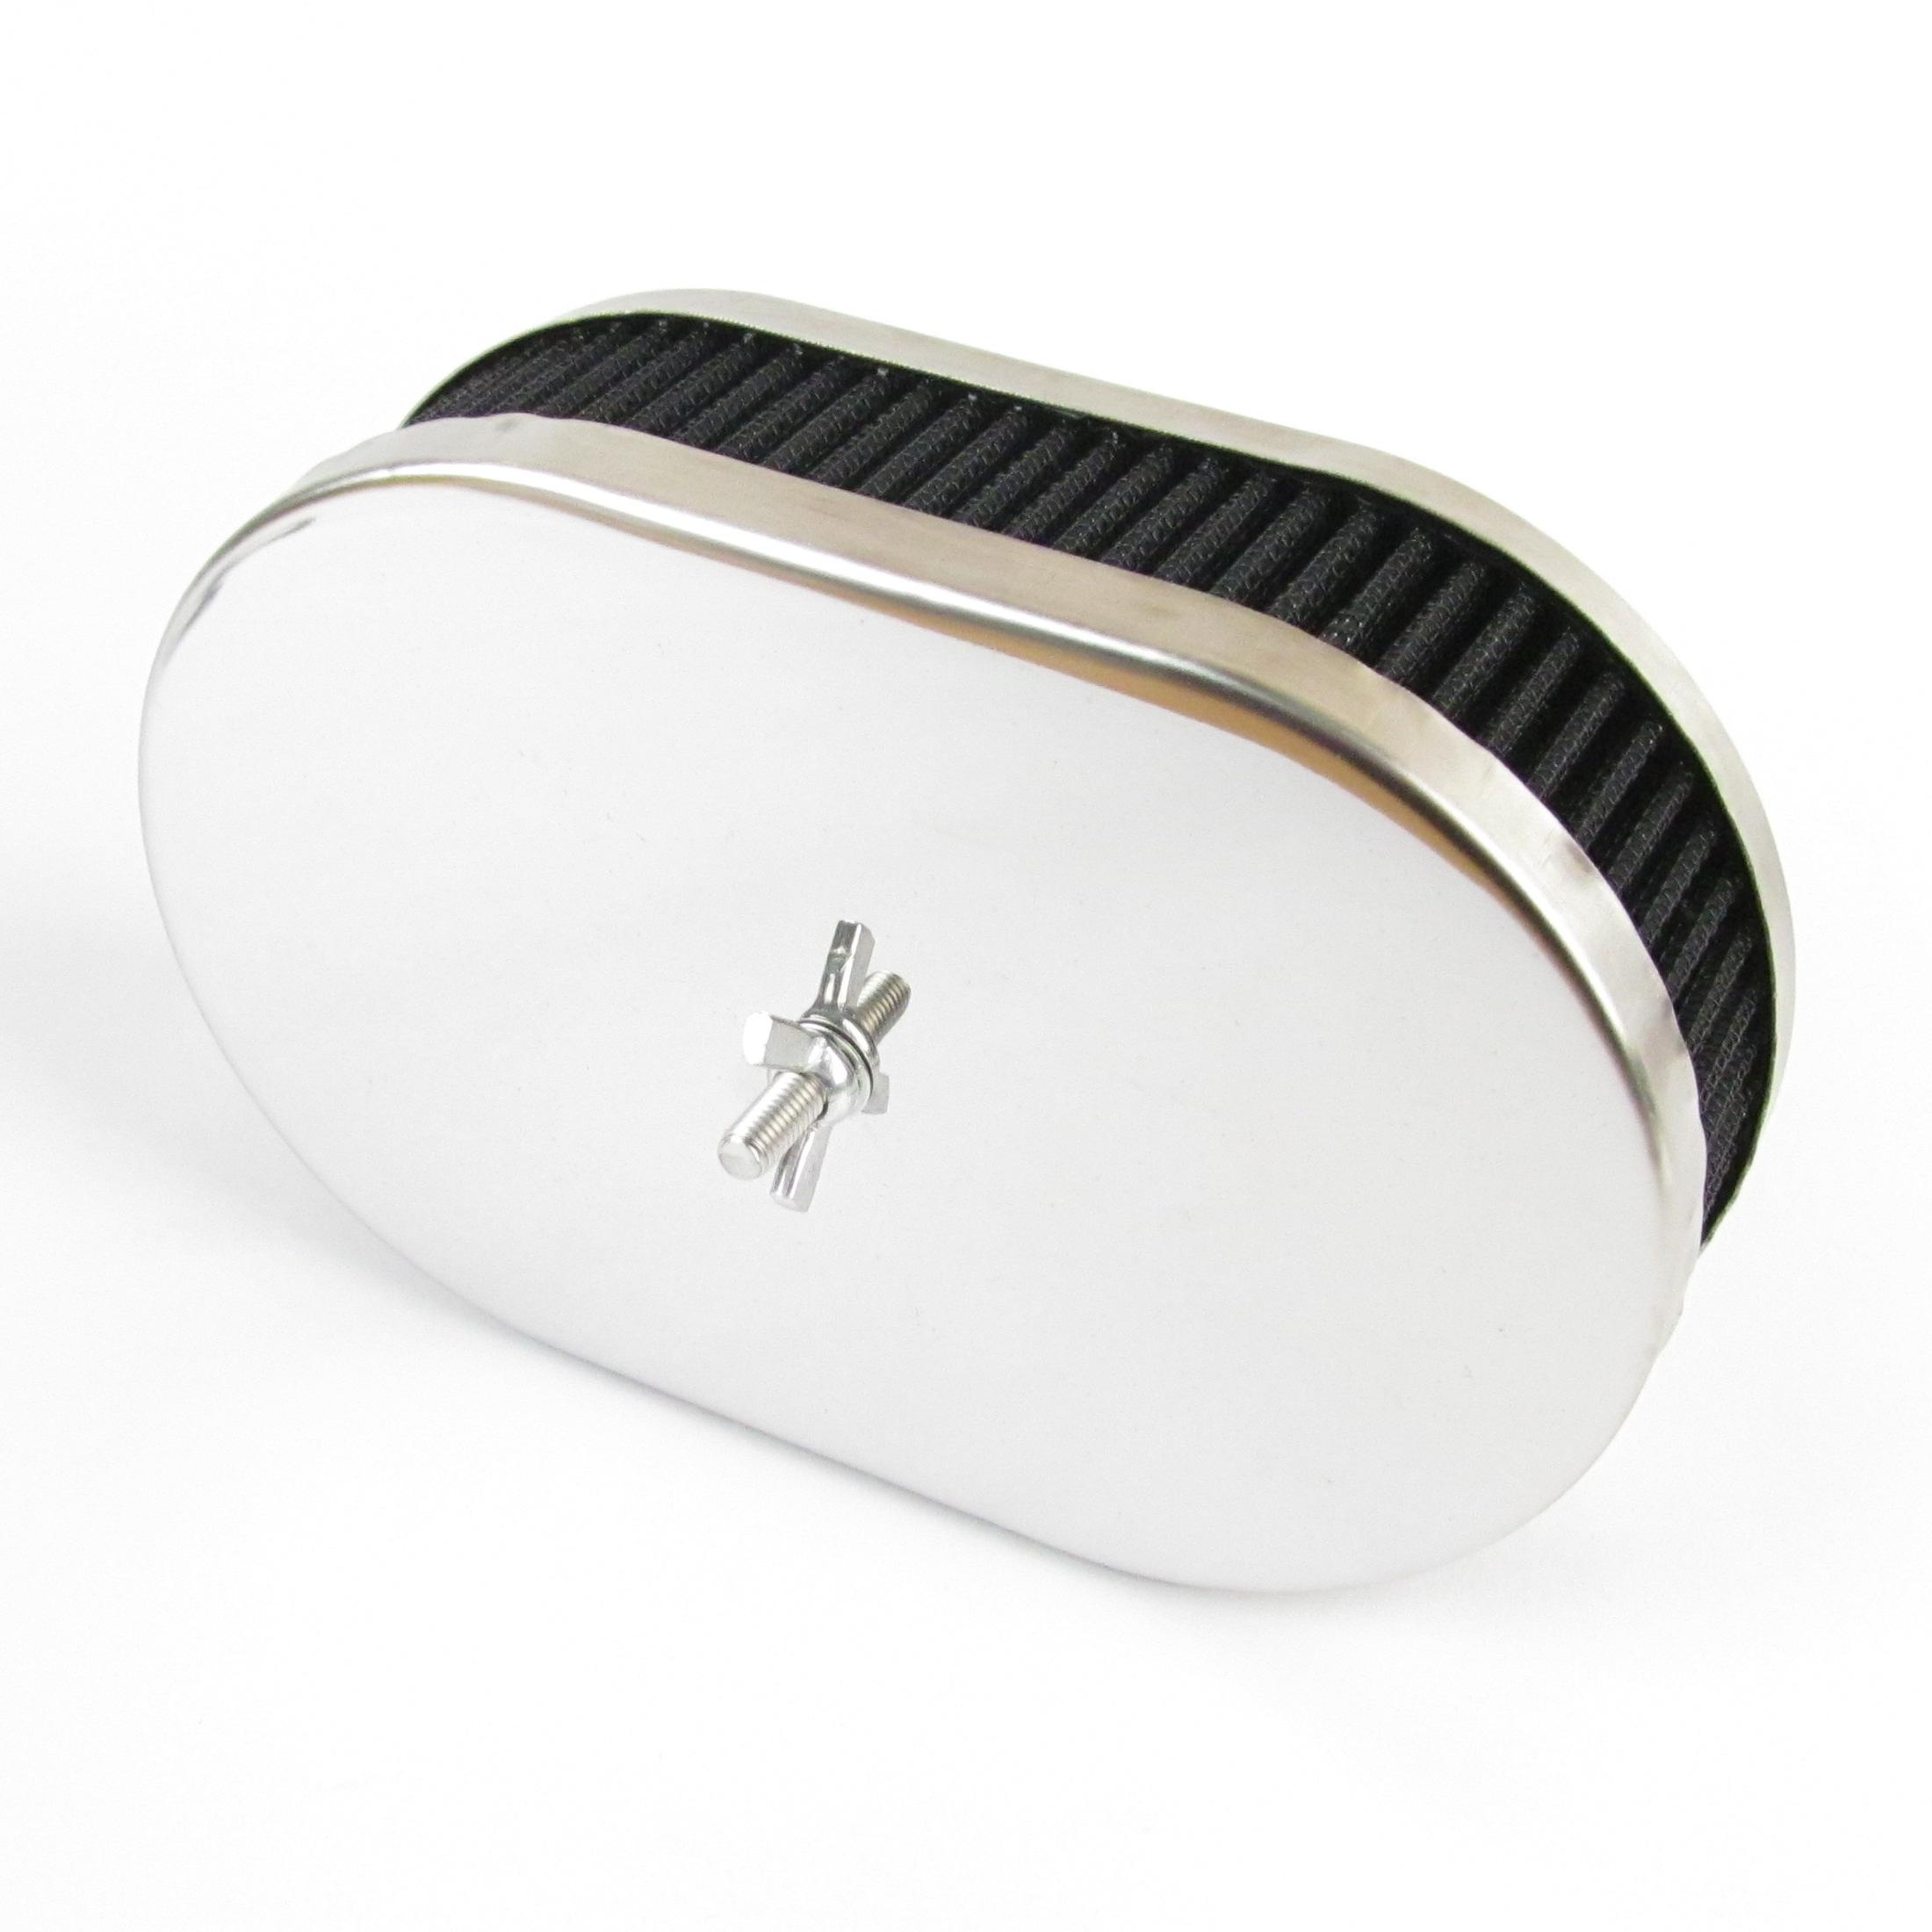 WEBER / DELLORTO / SOLEX DCOE / DHLA / ADDH TWIN CARB AIR FILTER / PUHASTUS (45mm sügav)